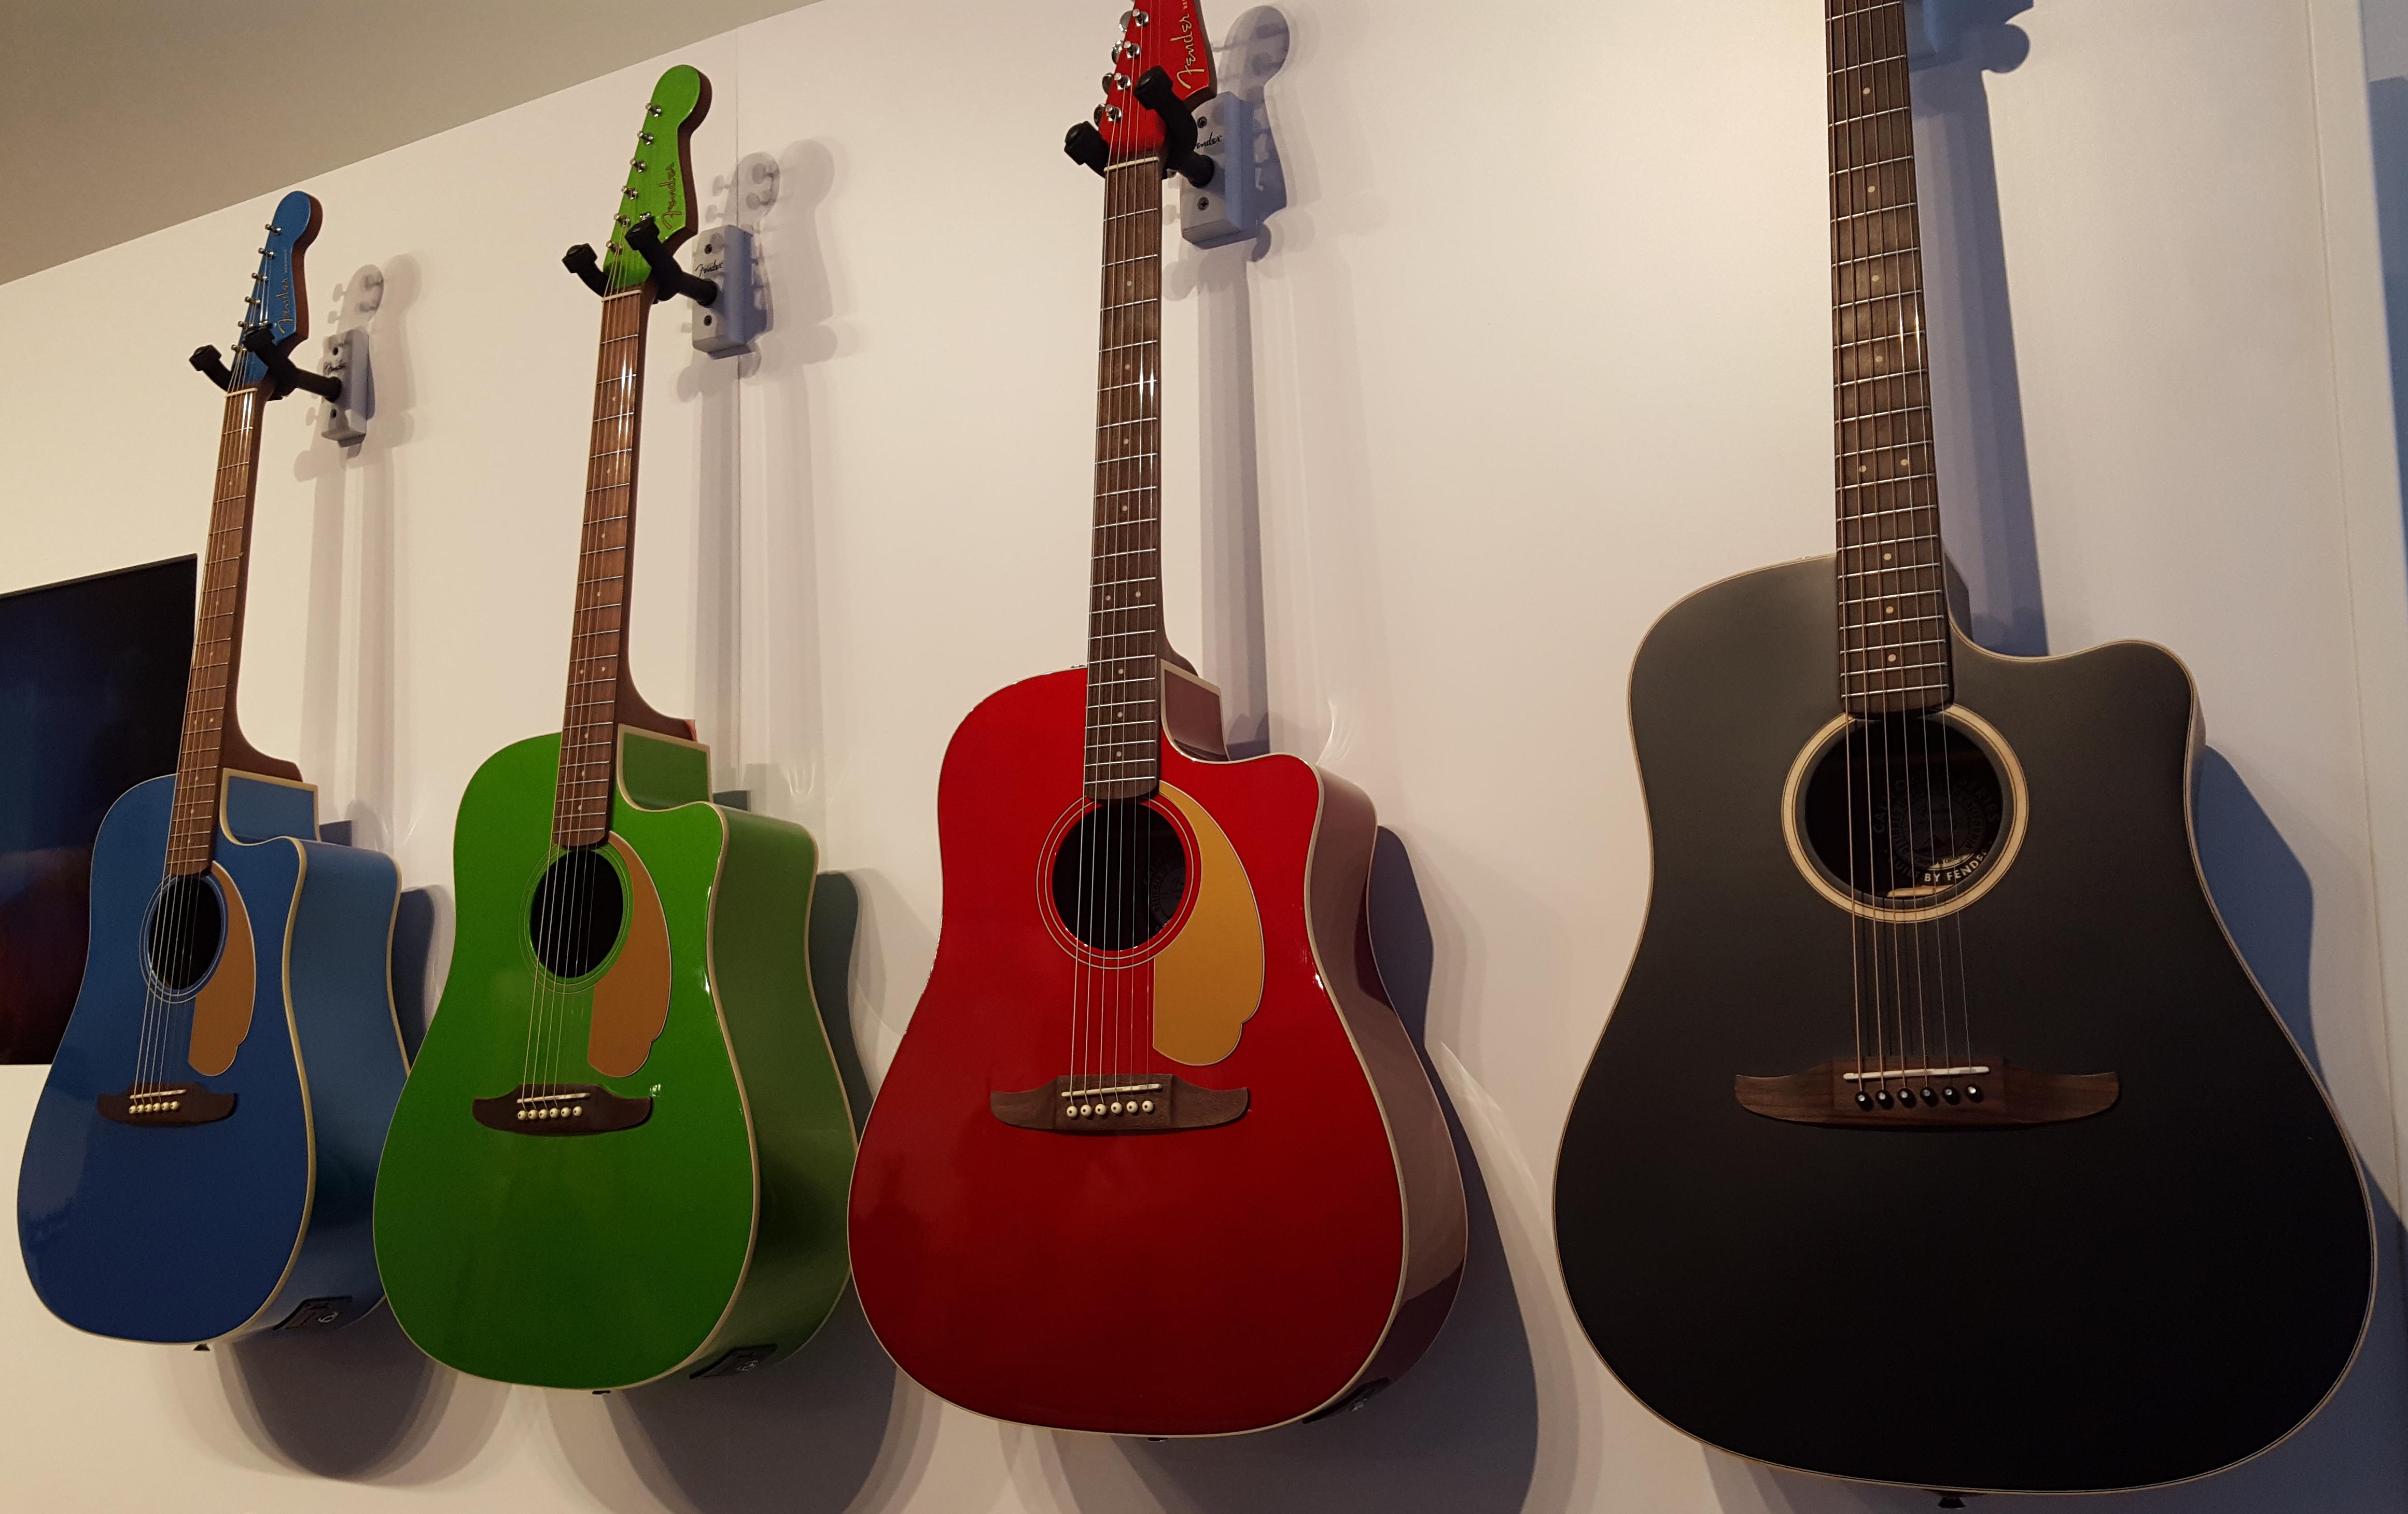 Fender's California Series acoustic guitars.